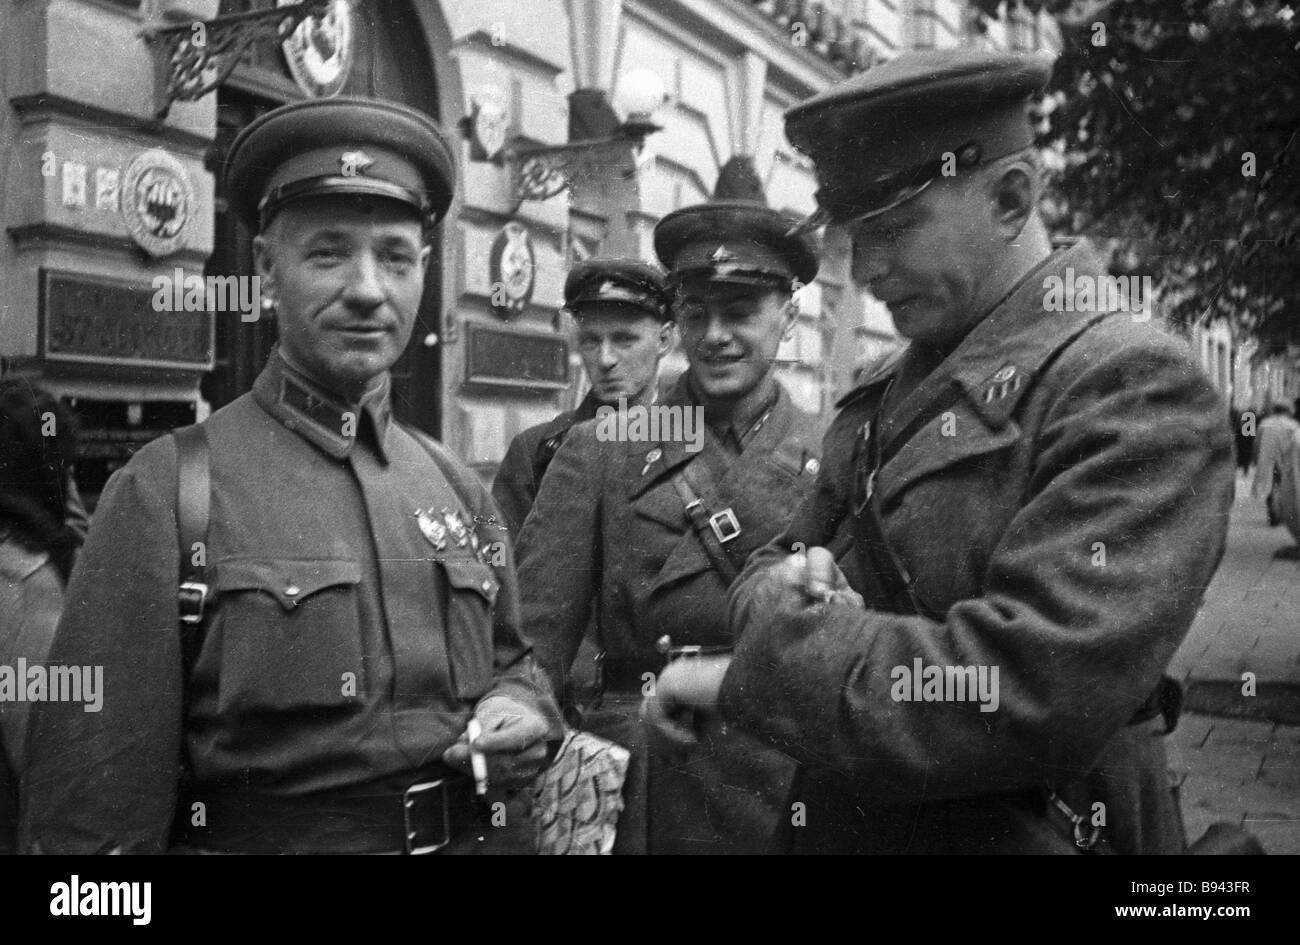 From right to left writers Vladimir Lugovskoi and Yevgeny Dolmatovsky with commander Ya T Chervichenko in Vilno - Stock Image